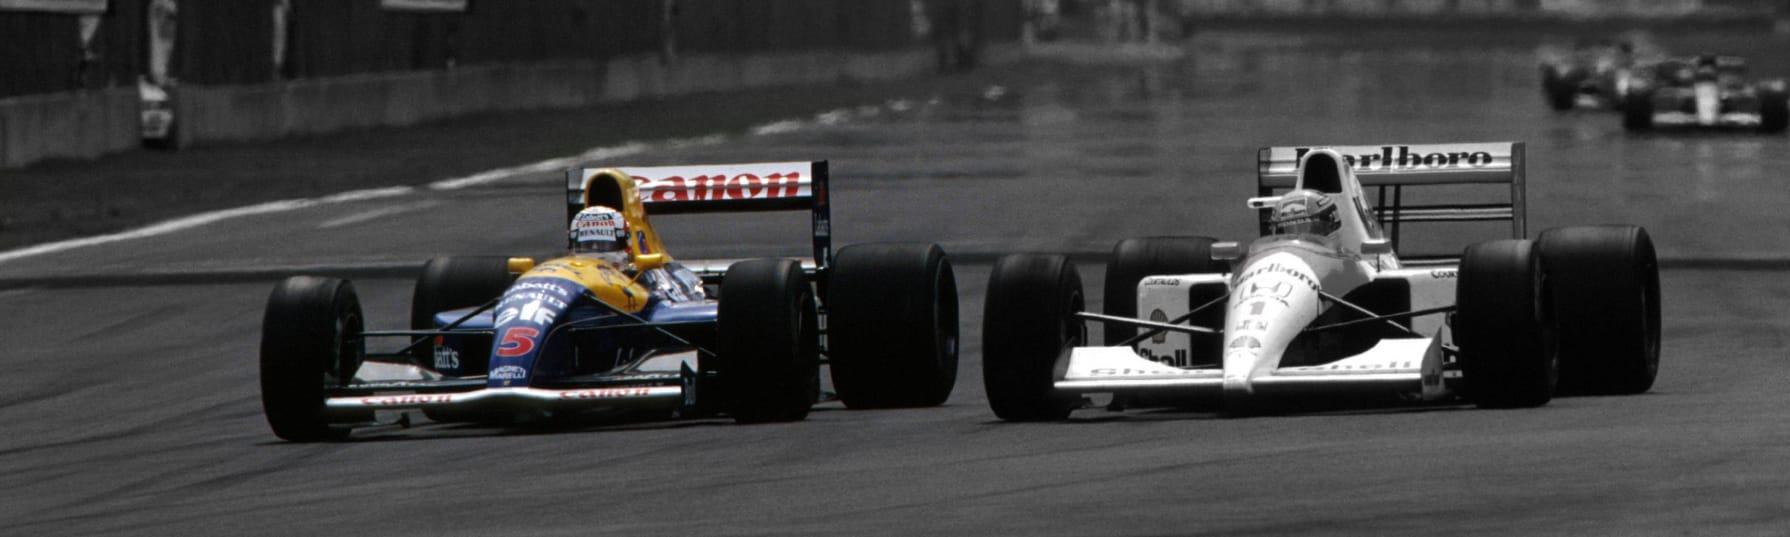 williams fw14b-renault - nigel mansell 1992